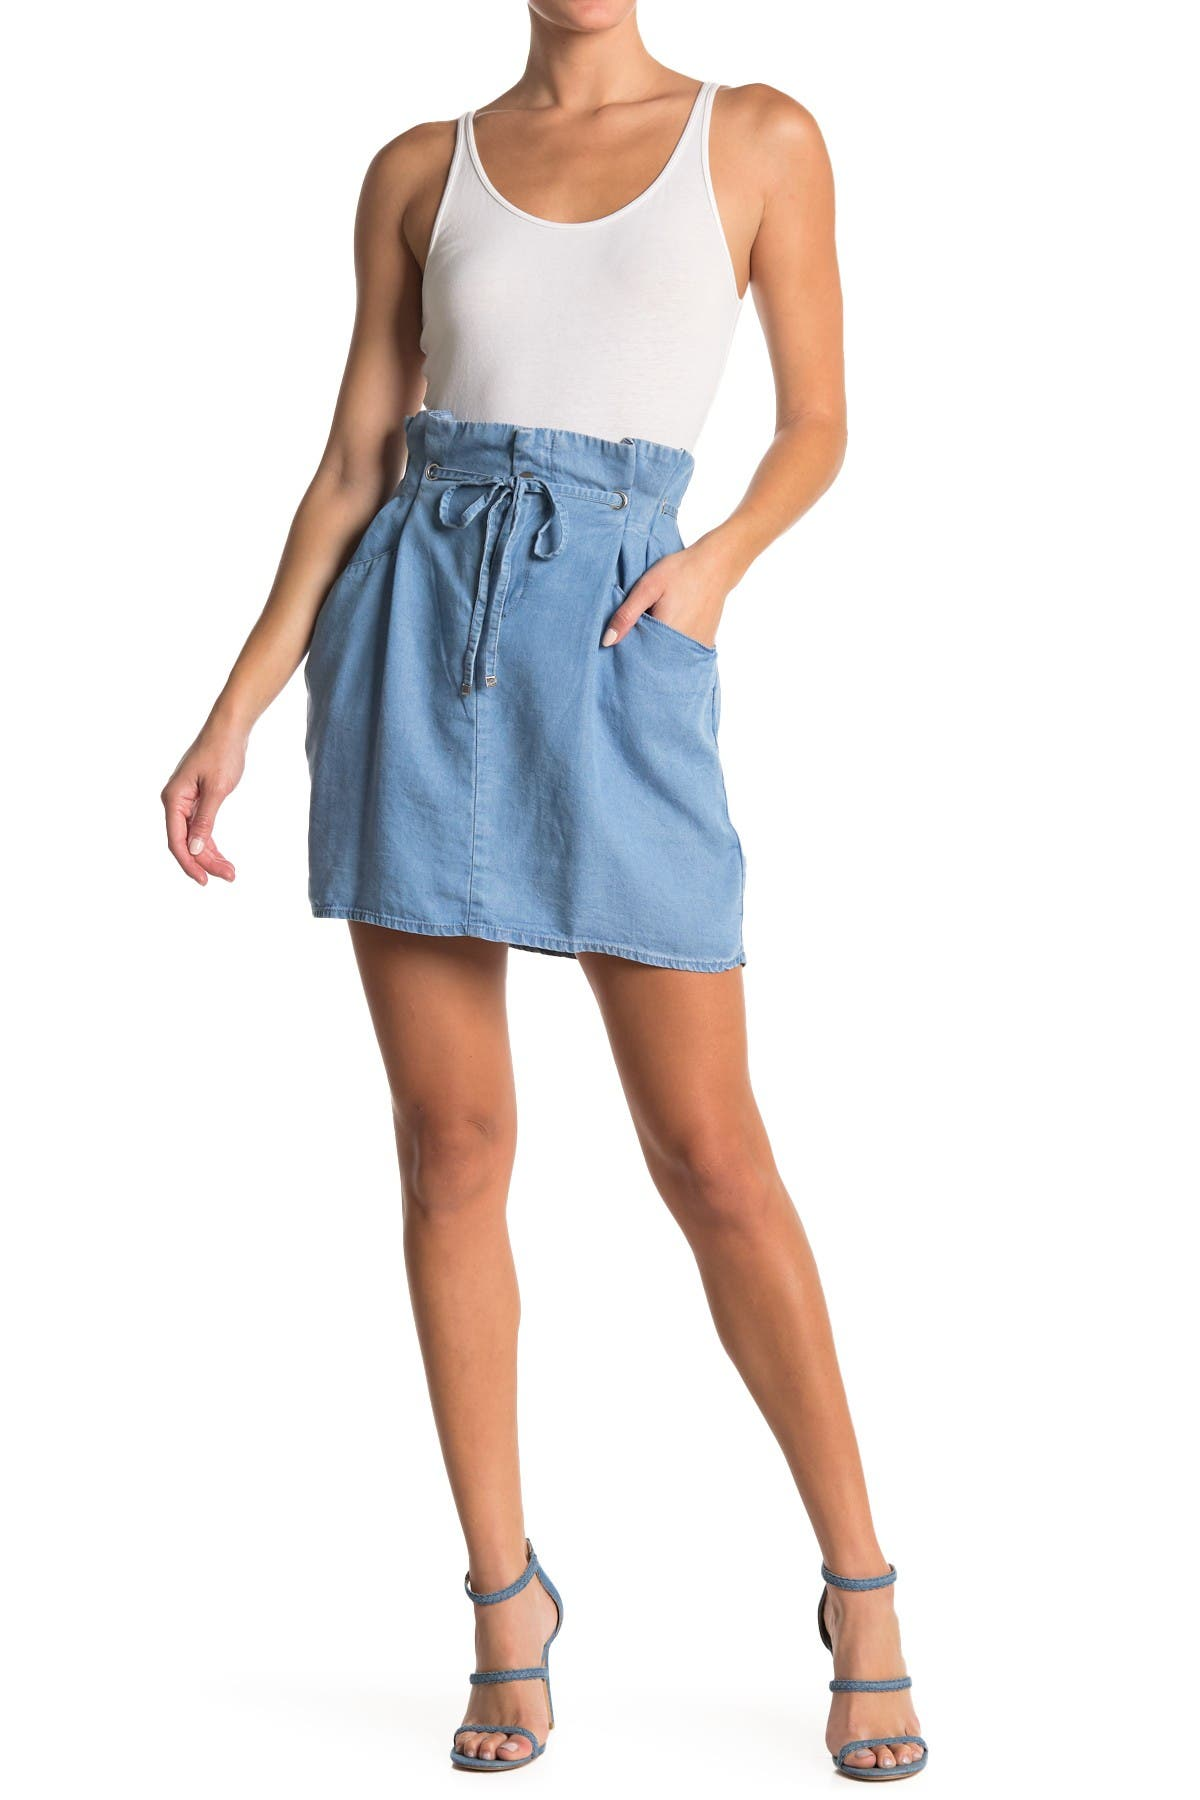 Image of Laundry By Shelli Segal Tencel Paperbag Waist Skirt